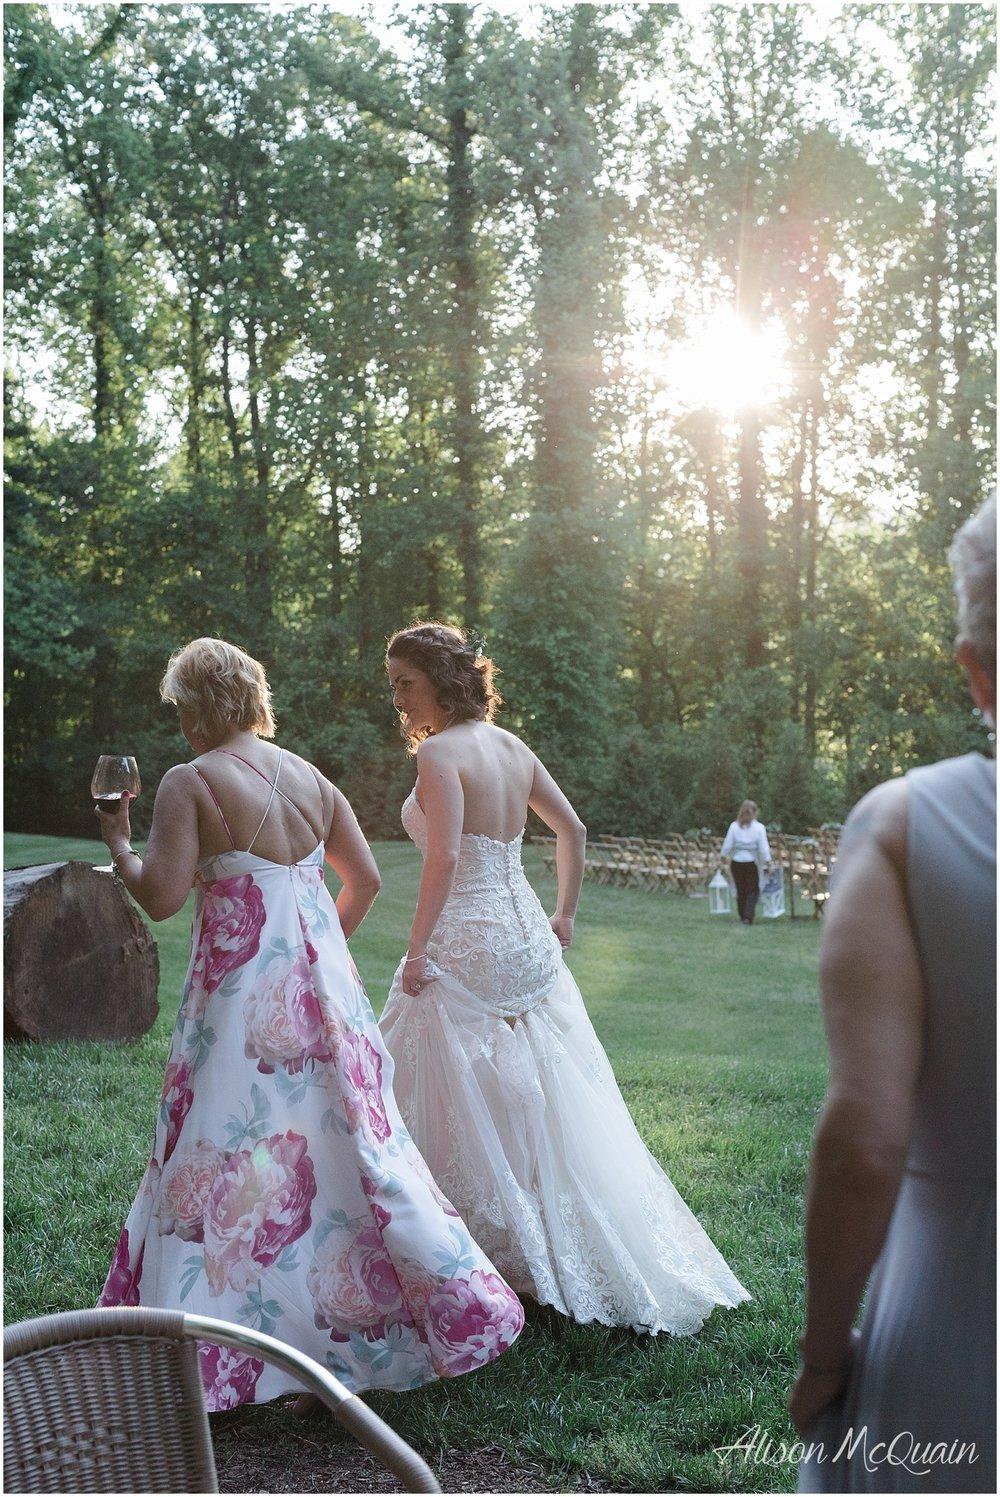 2018-05-23_0032LandC_wedding_dancingbearlodge_townsend_tn_amp.jpg